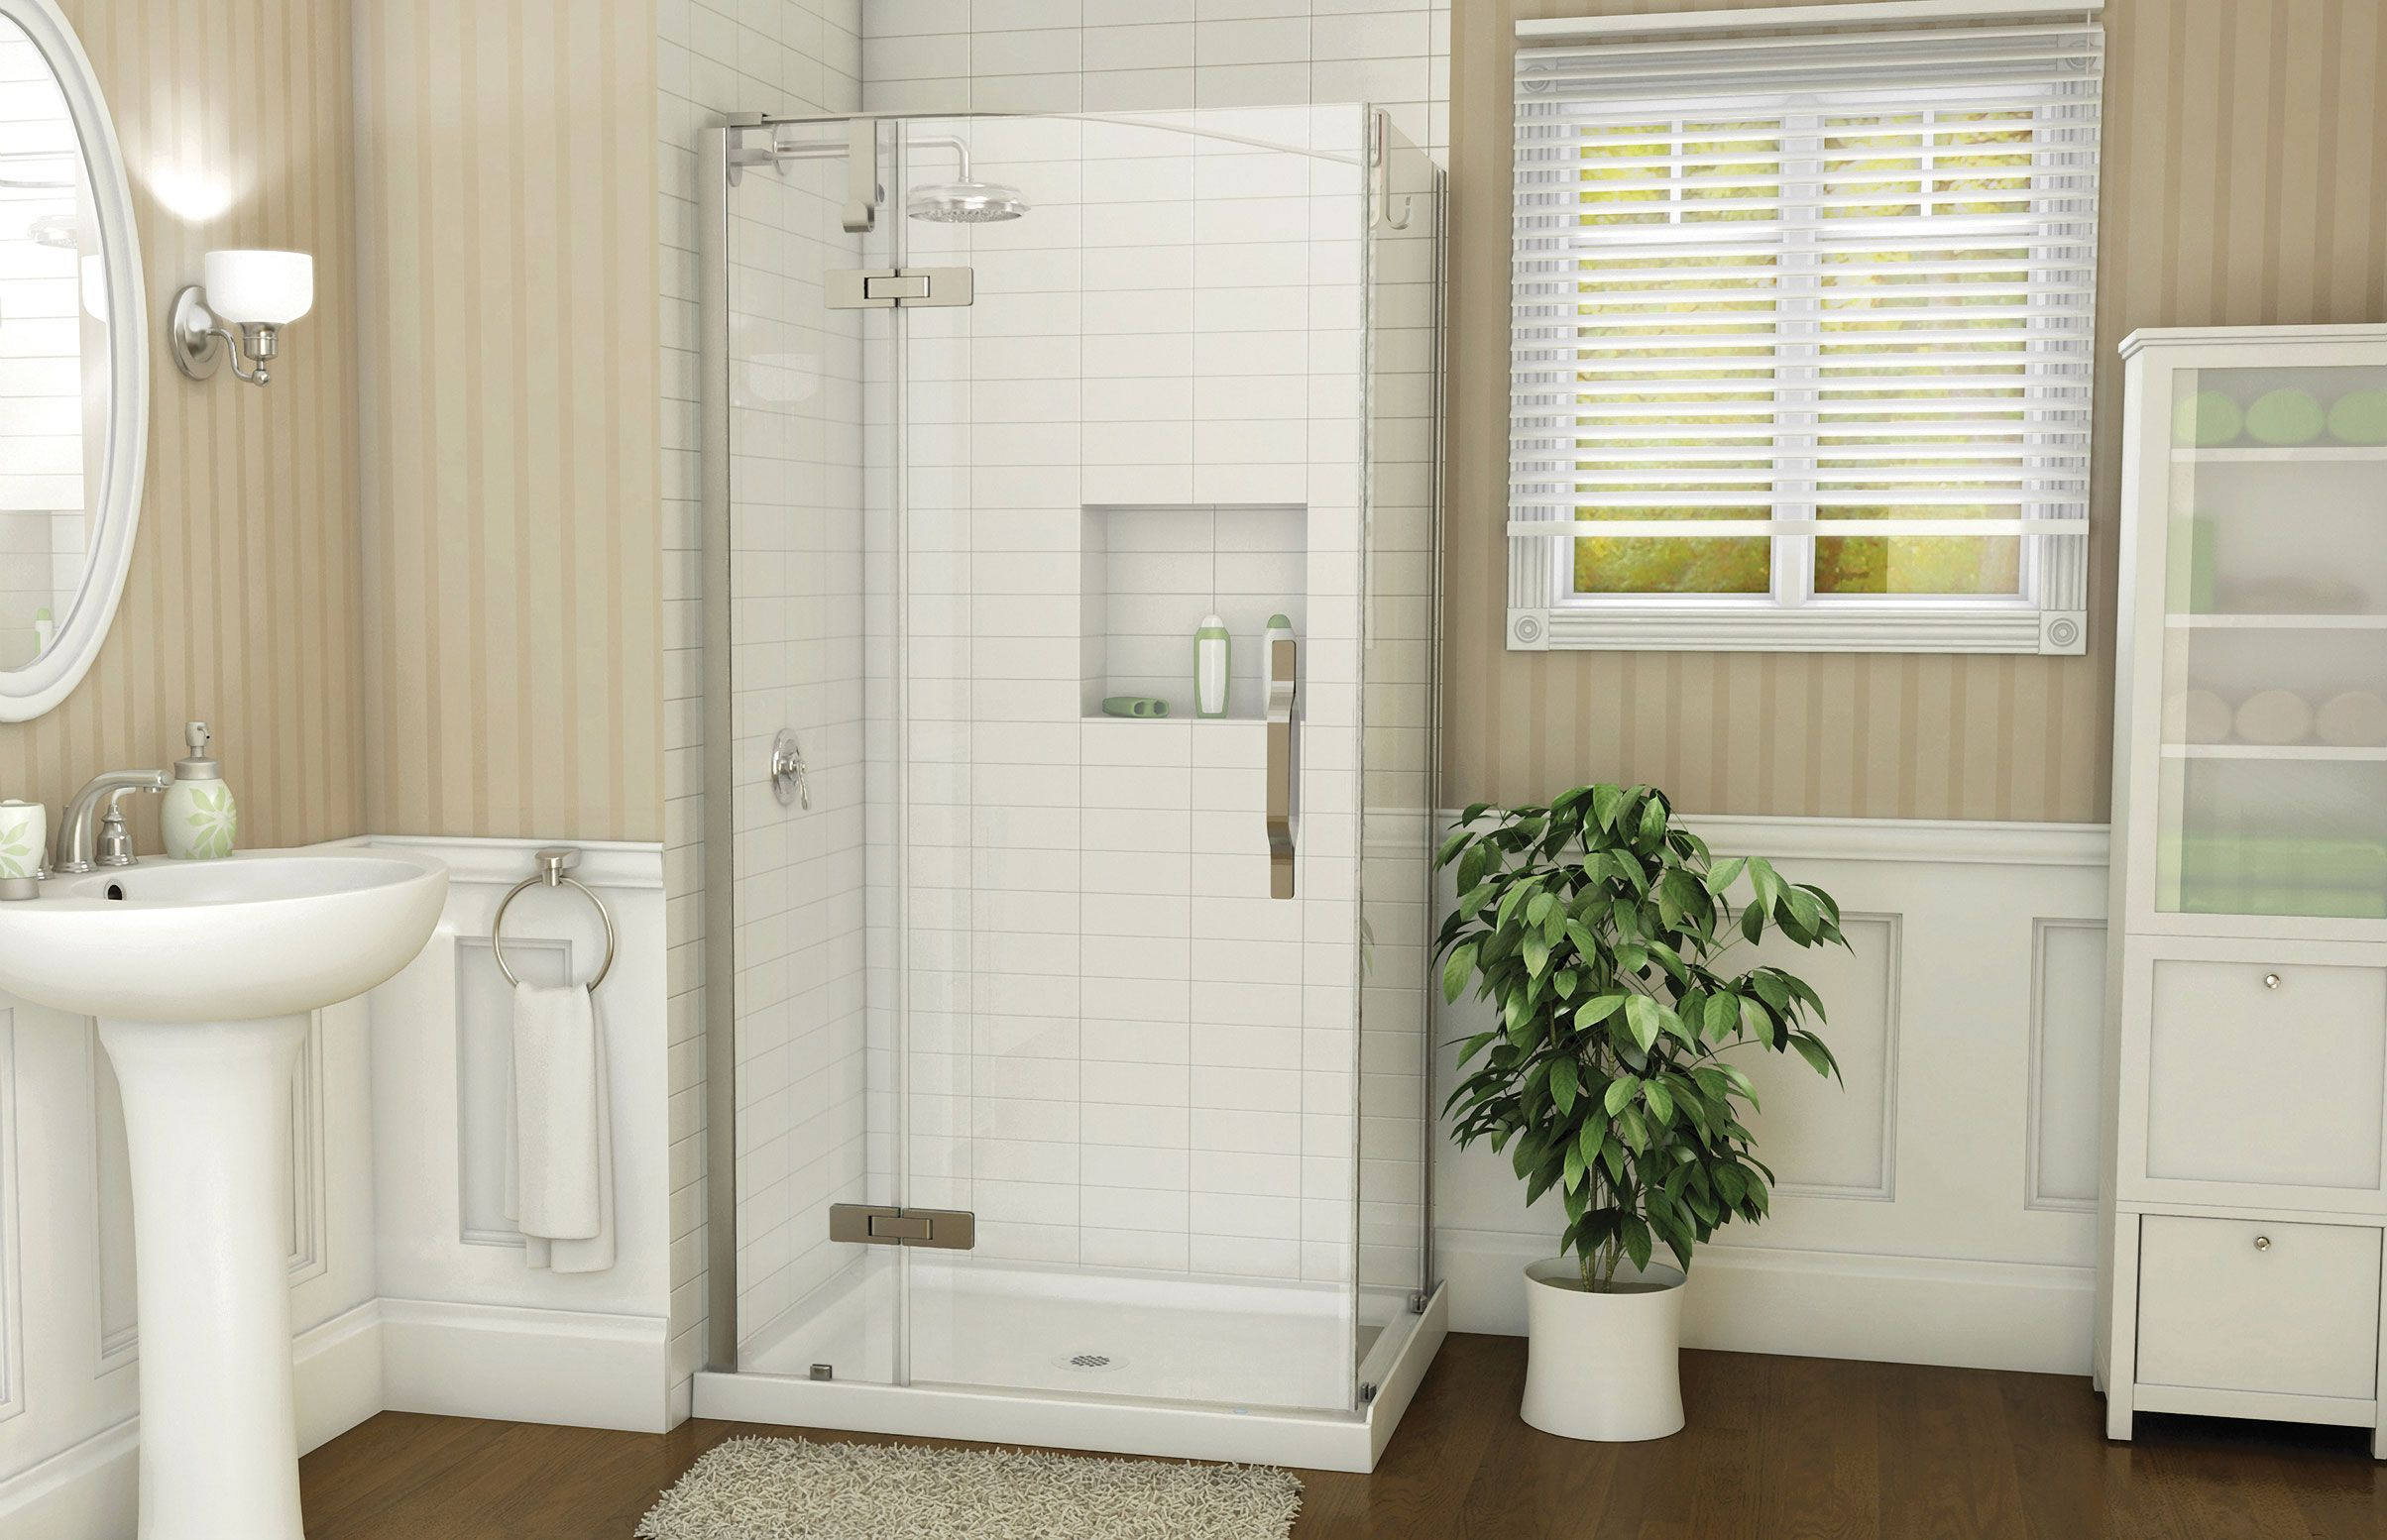 Azure 4234 Corner shower - Advanta by MAAX? | MAAX | Pinterest | Corner